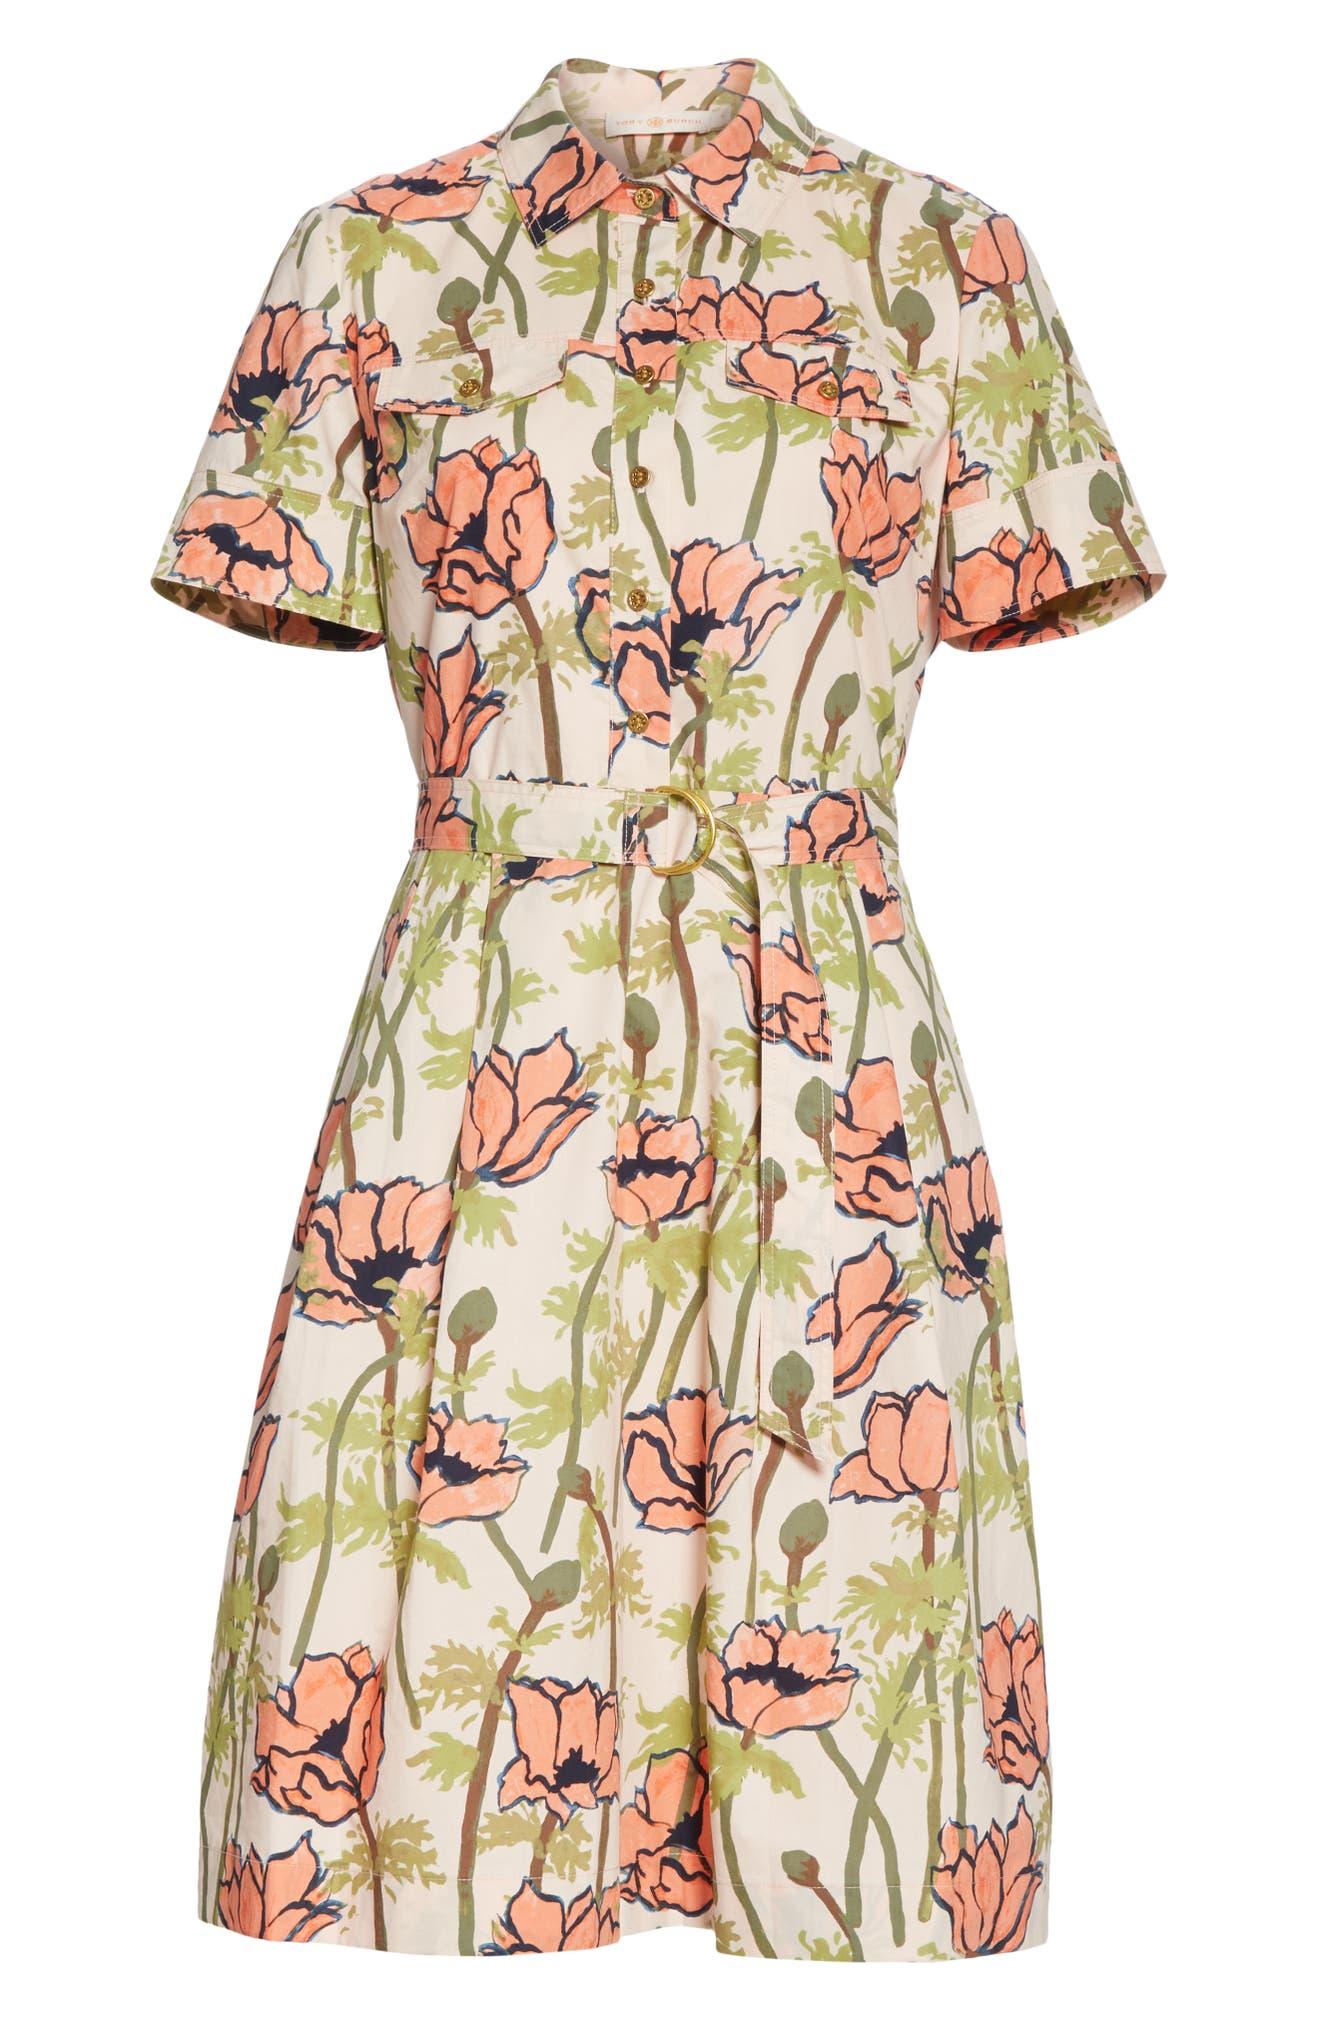 64101447da Tory Burch Floral Poplin Shirtdress | Nordstrom